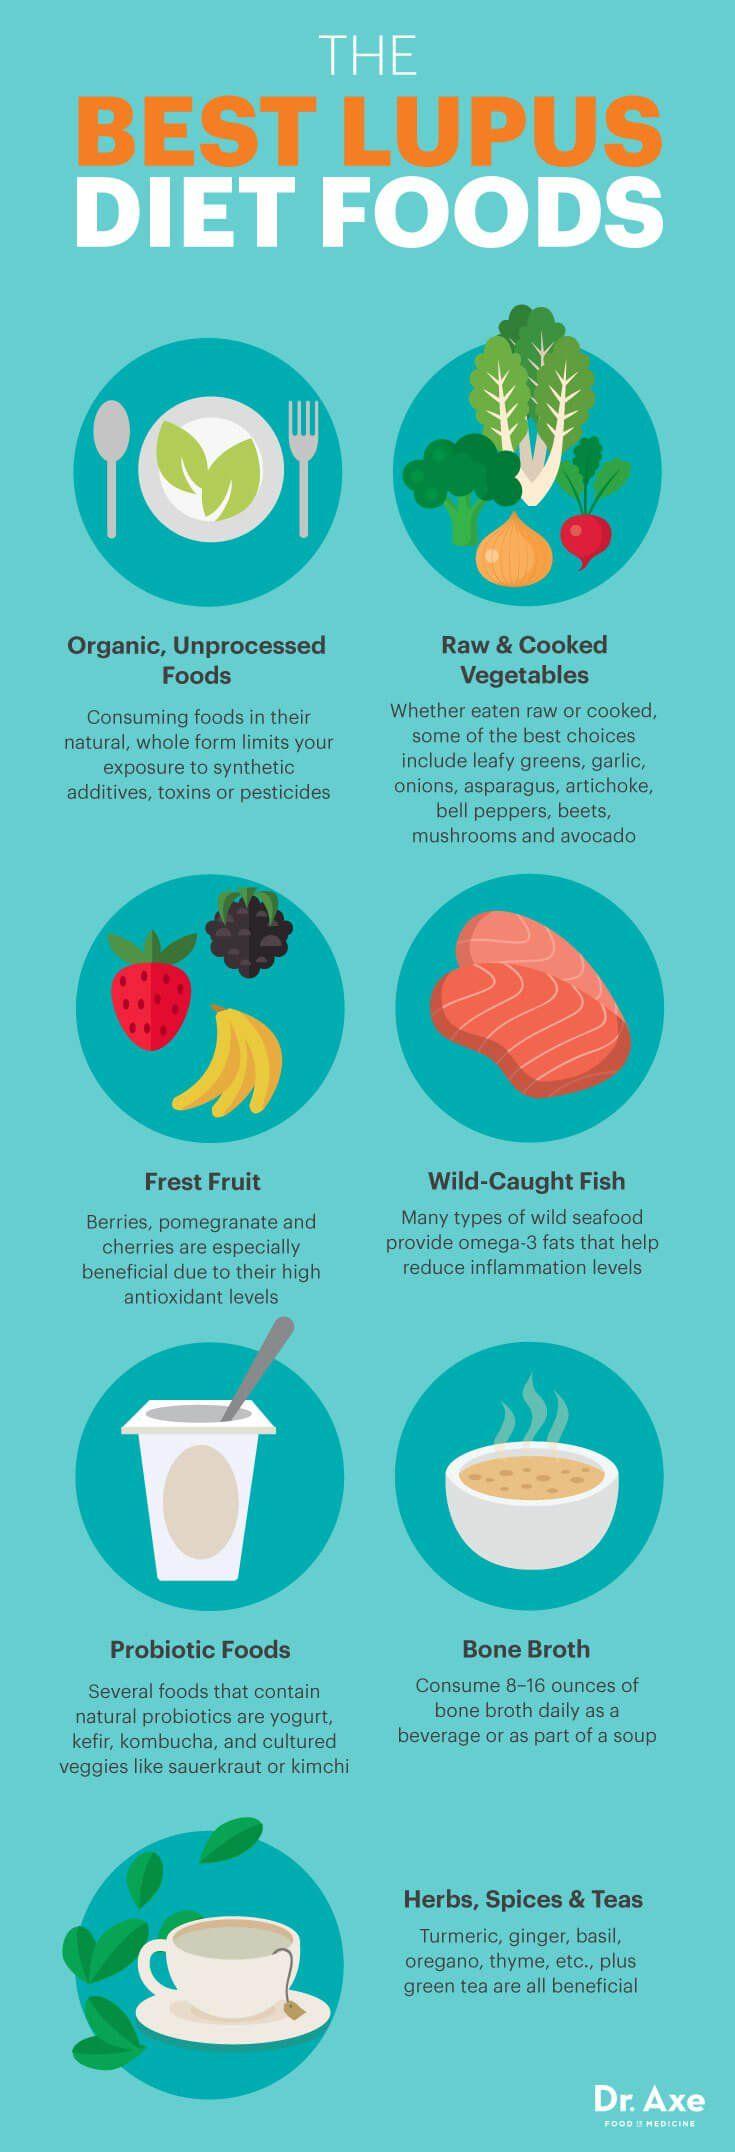 The best lupus diet foods - Dr. Axe